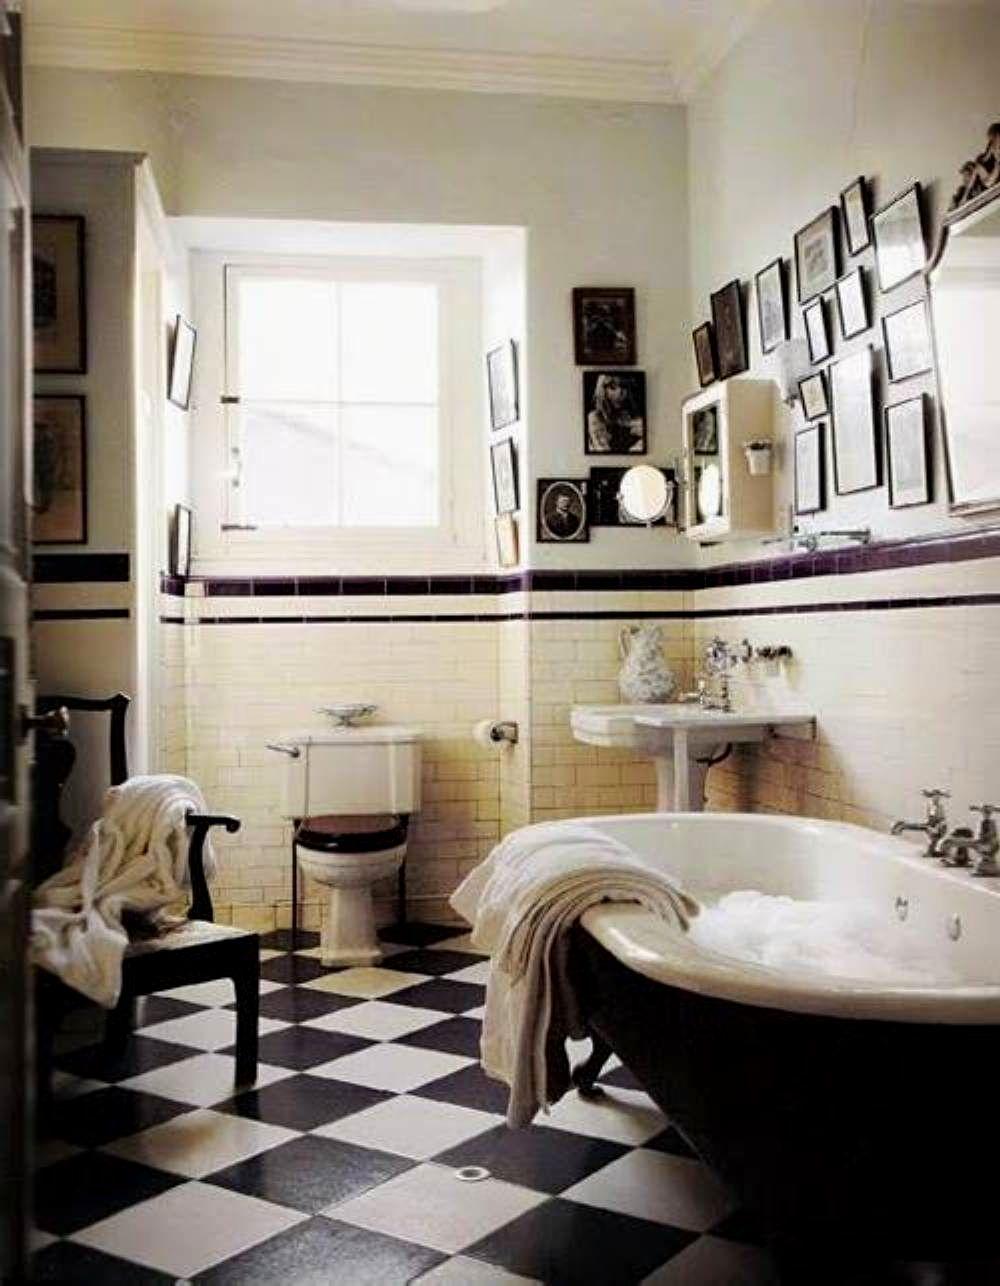 cute bathroom wall cabinets gallery-Best Of Bathroom Wall Cabinets Model